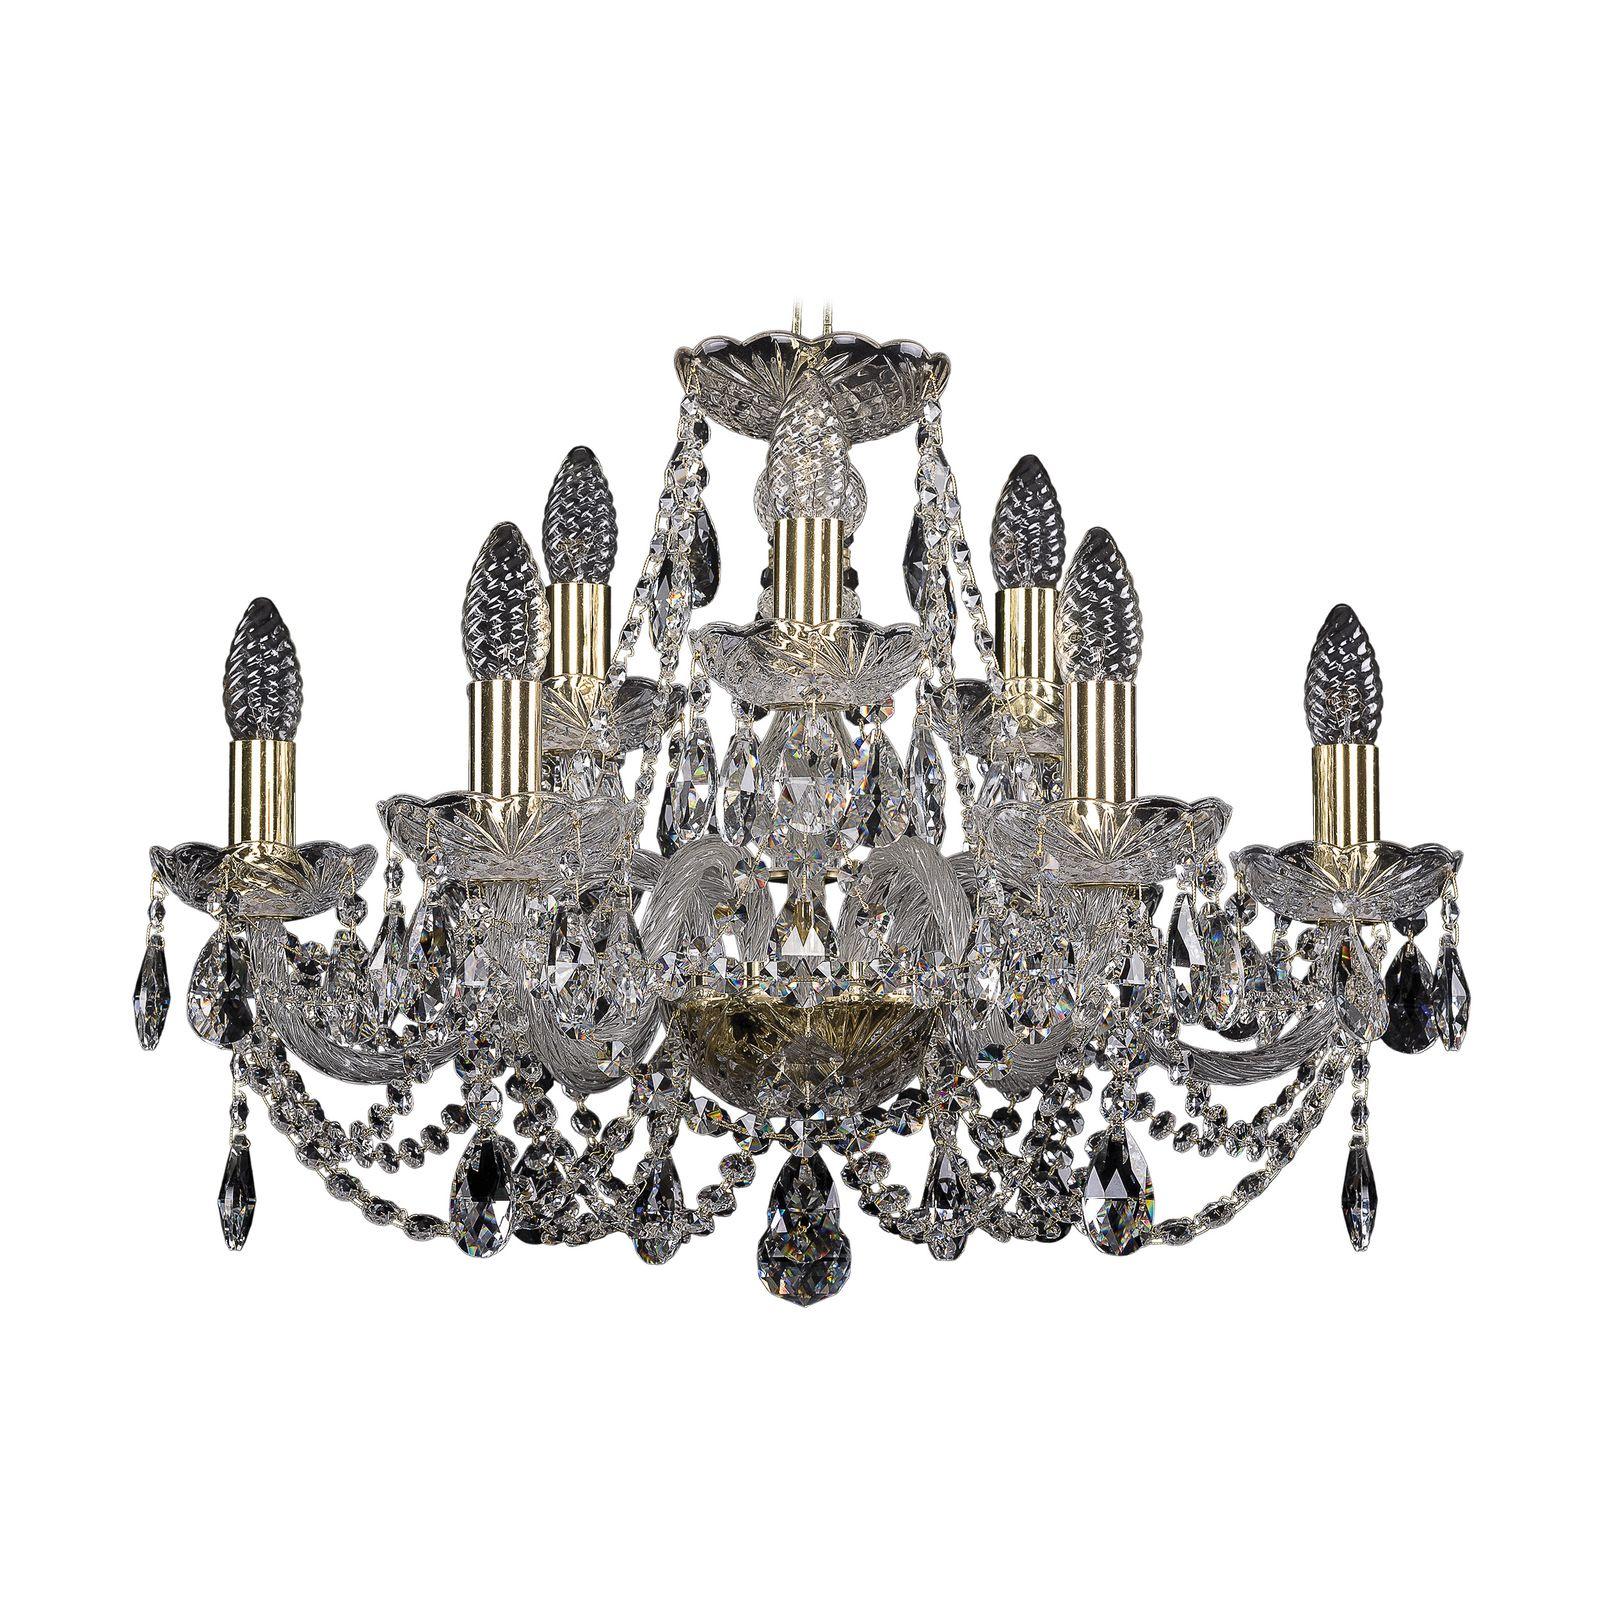 Потолочный светильник Bohemia Ivele Crystal 1406/6+3/195 G, E14, 40 Вт bohemia ivele crystal 1932 75z g